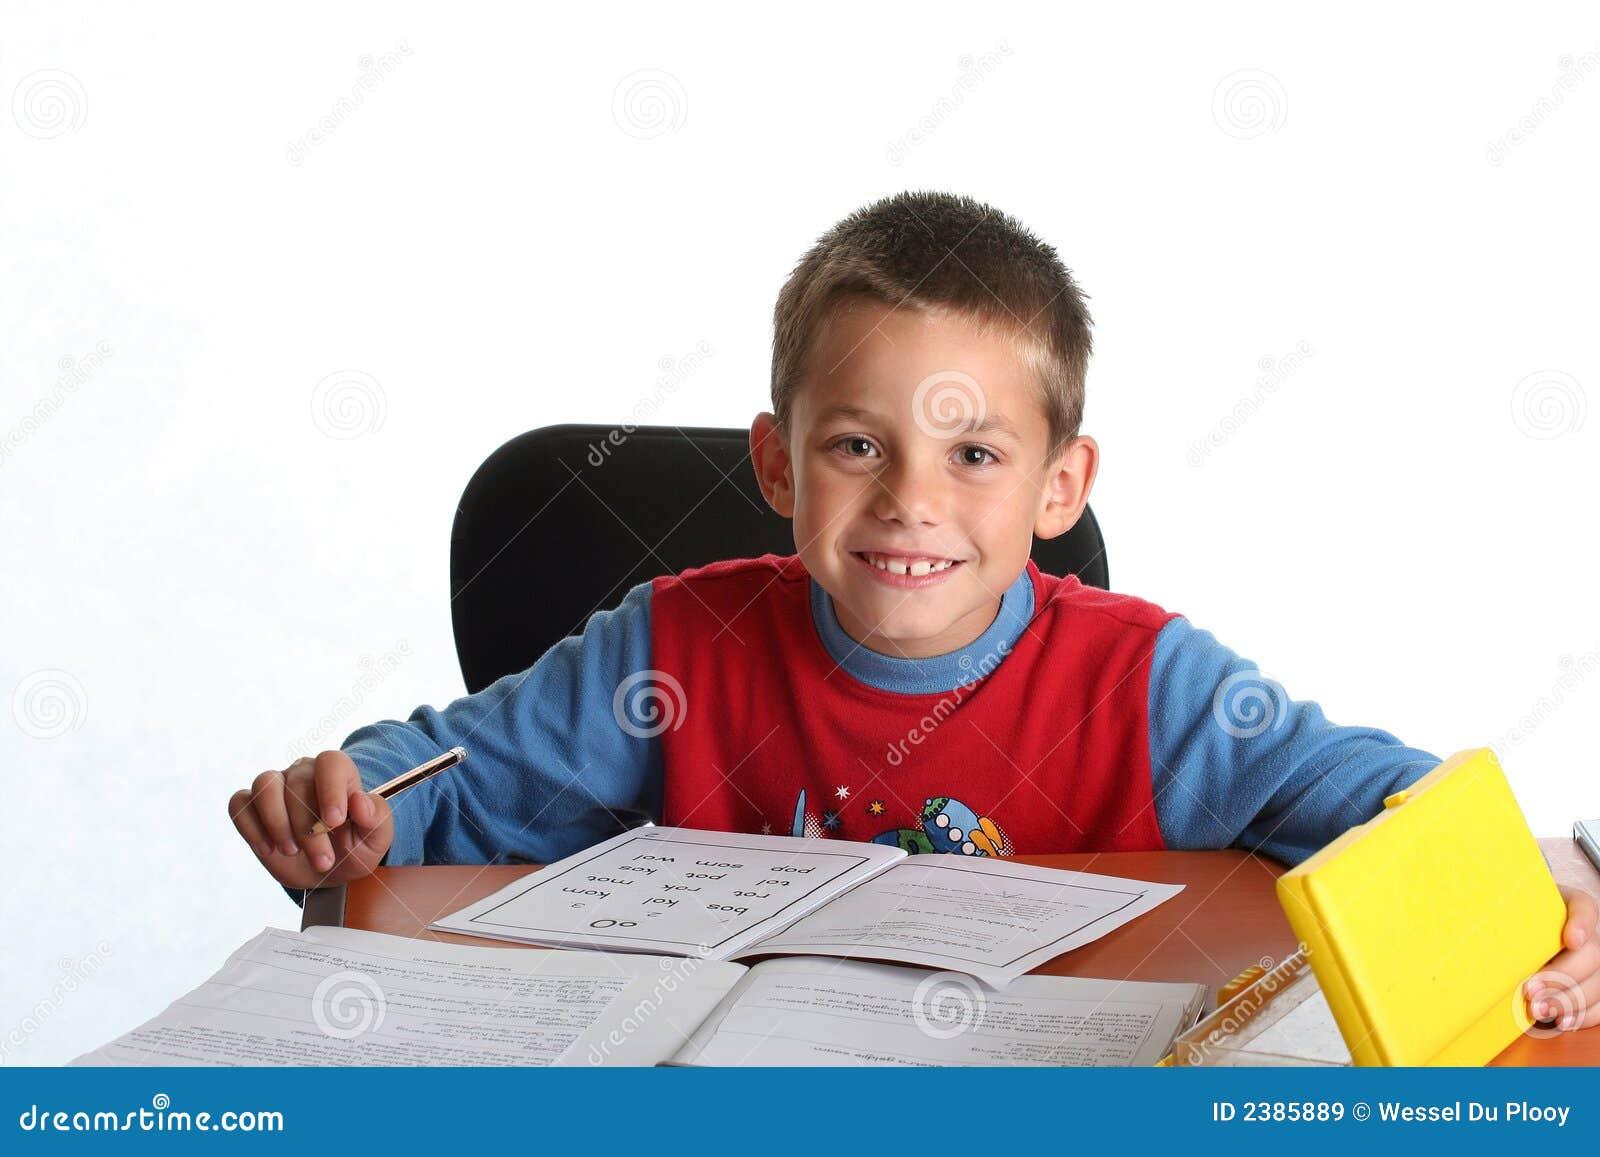 boy calls 911 for help with math homework